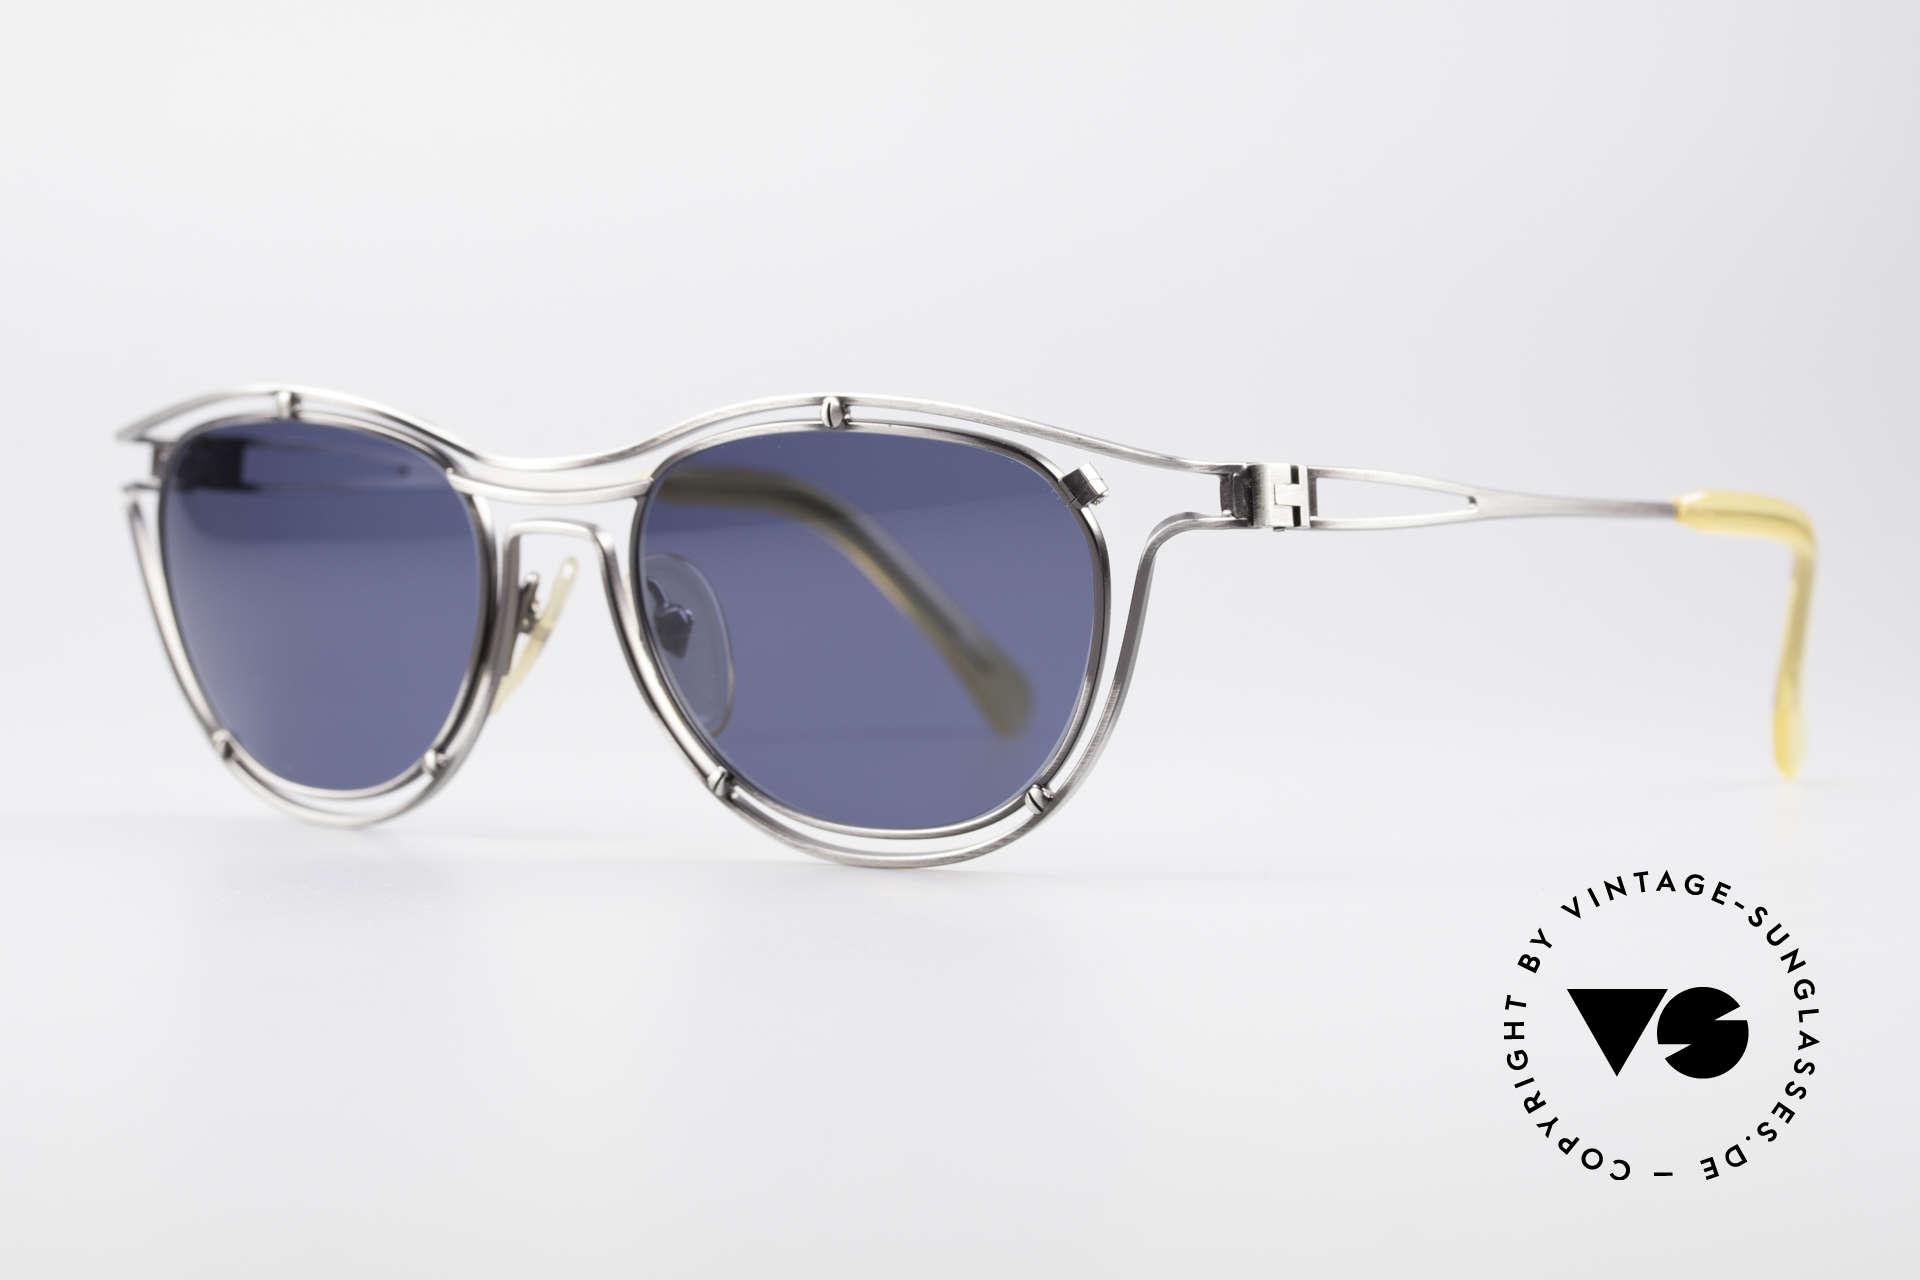 Jean Paul Gaultier 56-2176 True Designer Sunglasses, brushed titan with dark-blue sun lenses; 100% UV, Made for Men and Women